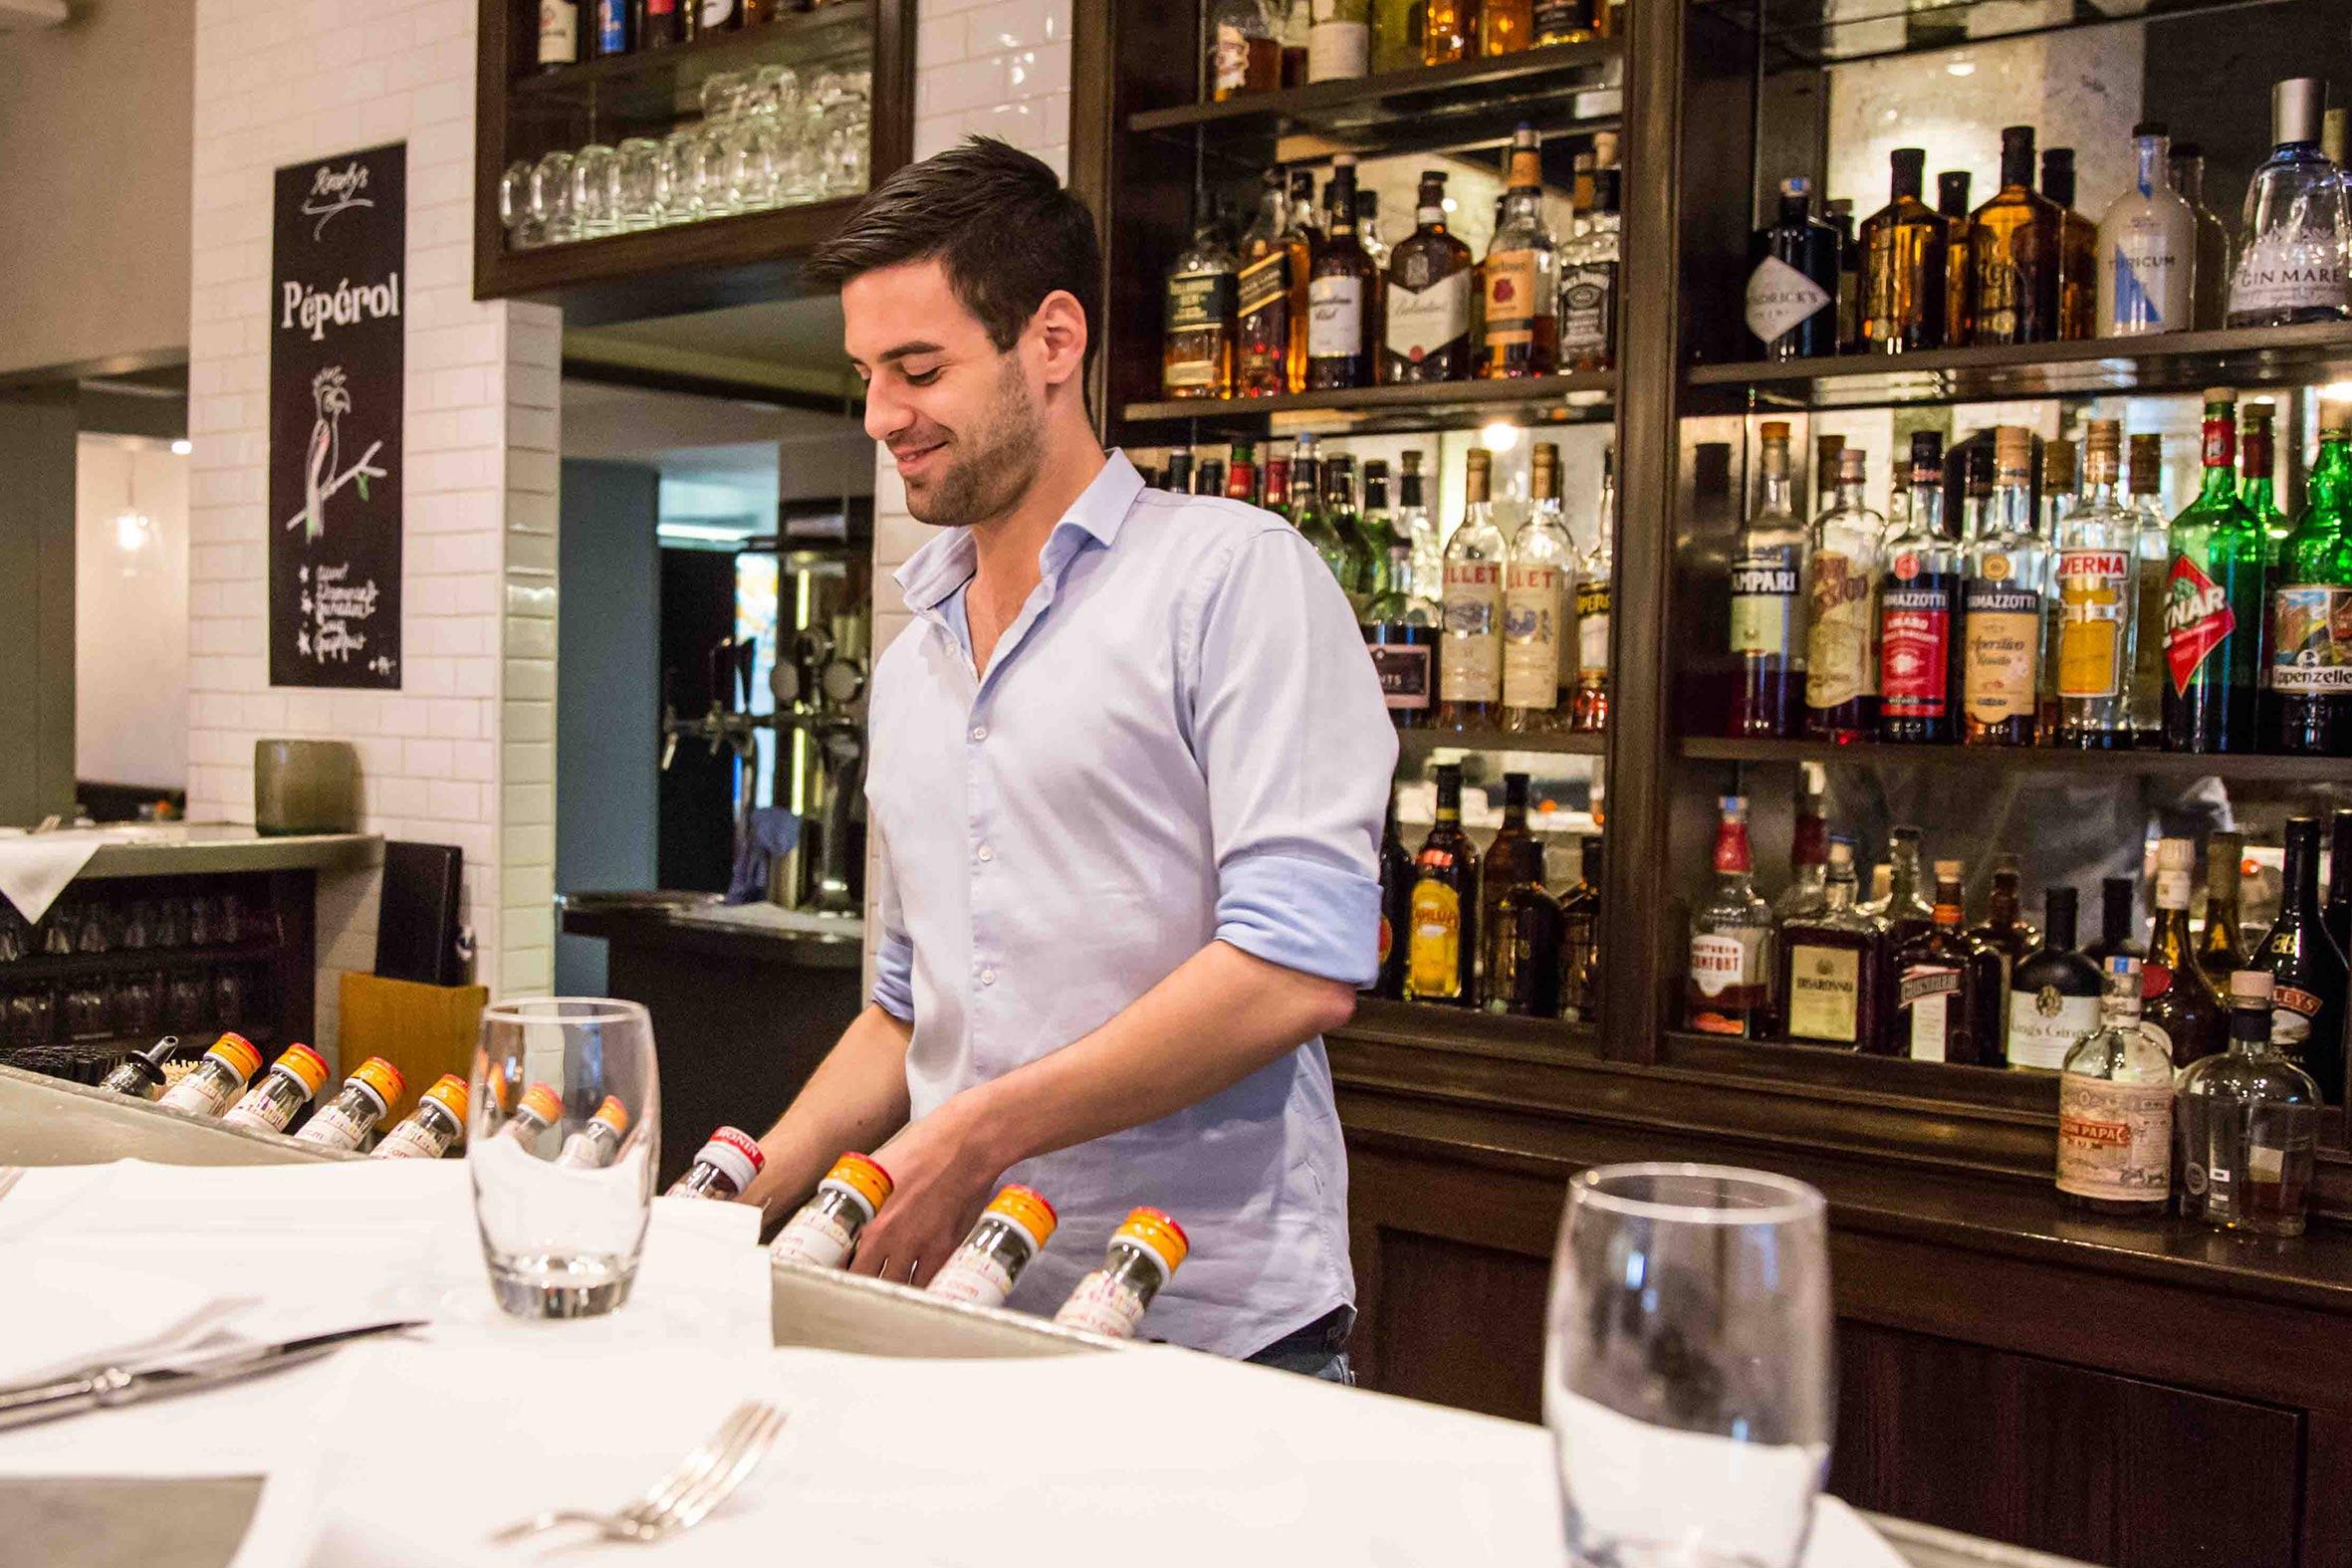 rosalys-restaurant-bar-zuerich-dario-klac